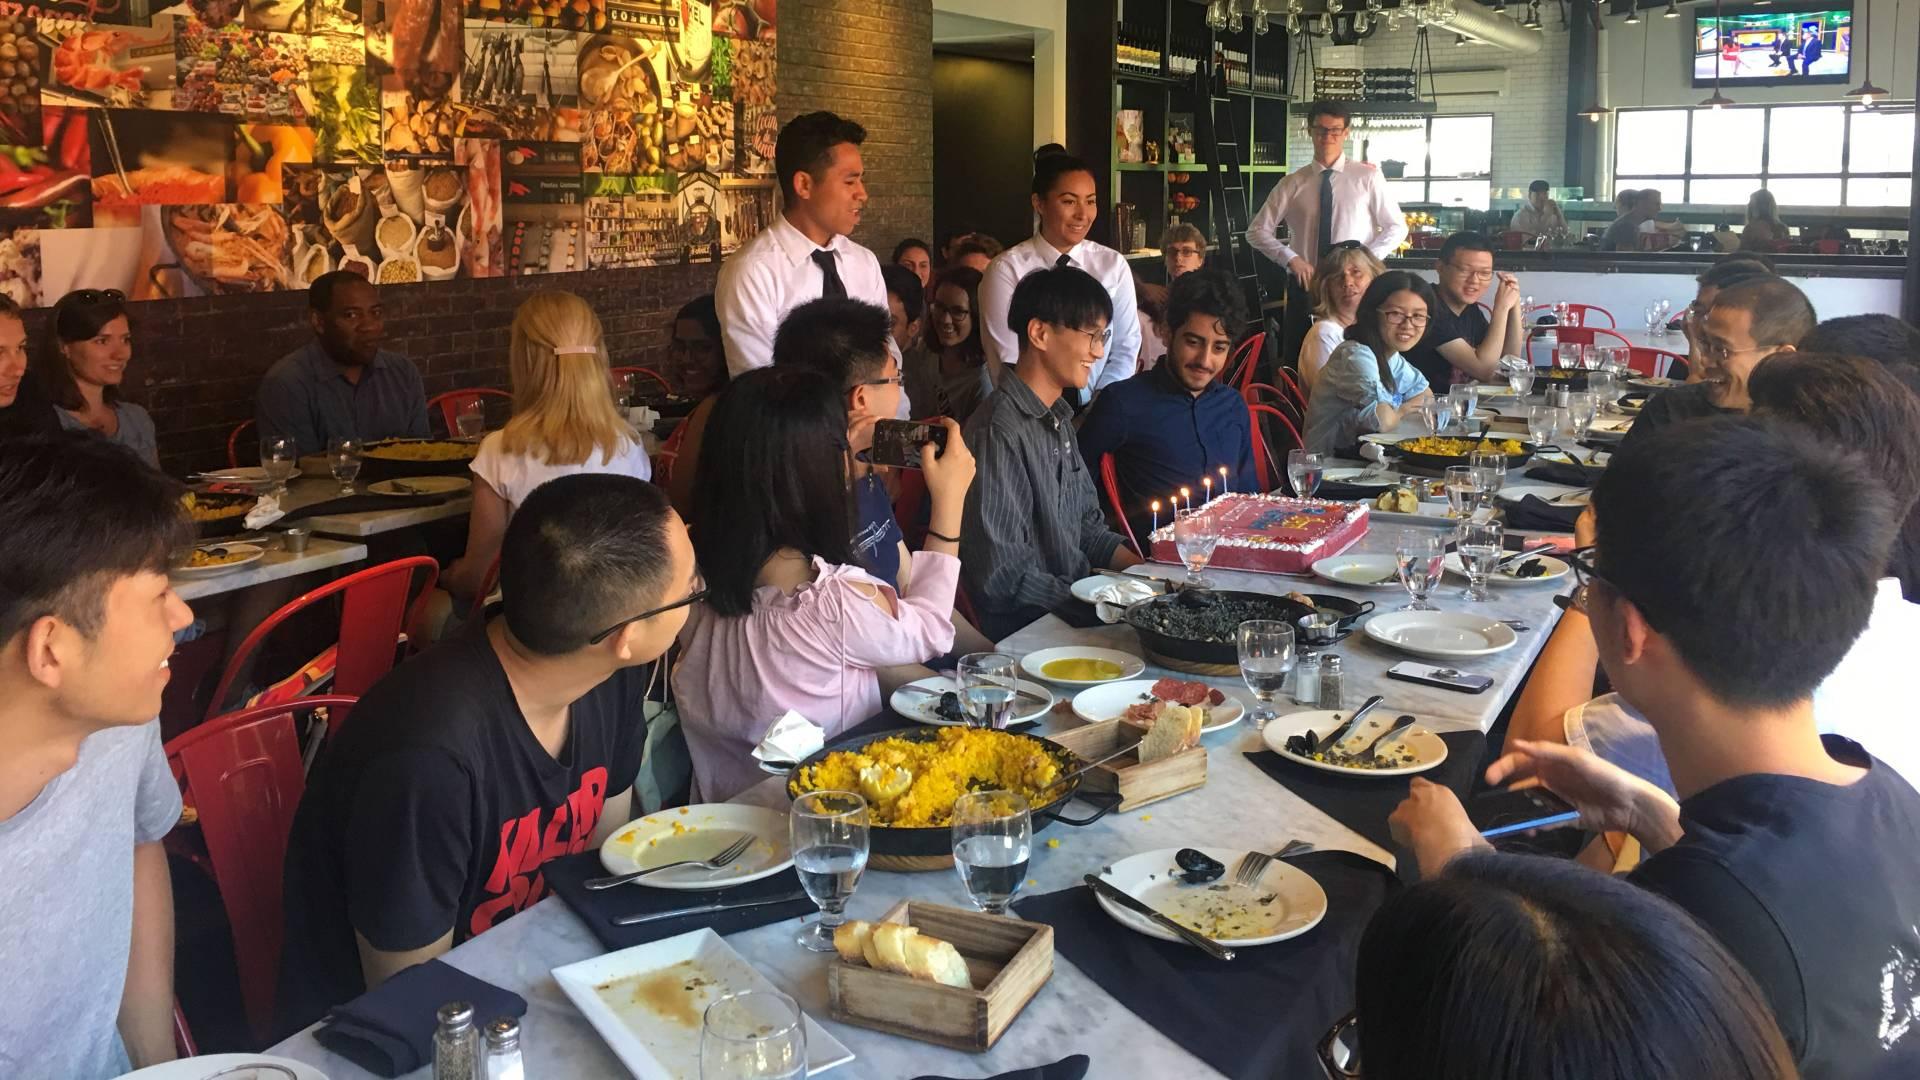 International students celebrating birthday at lunch